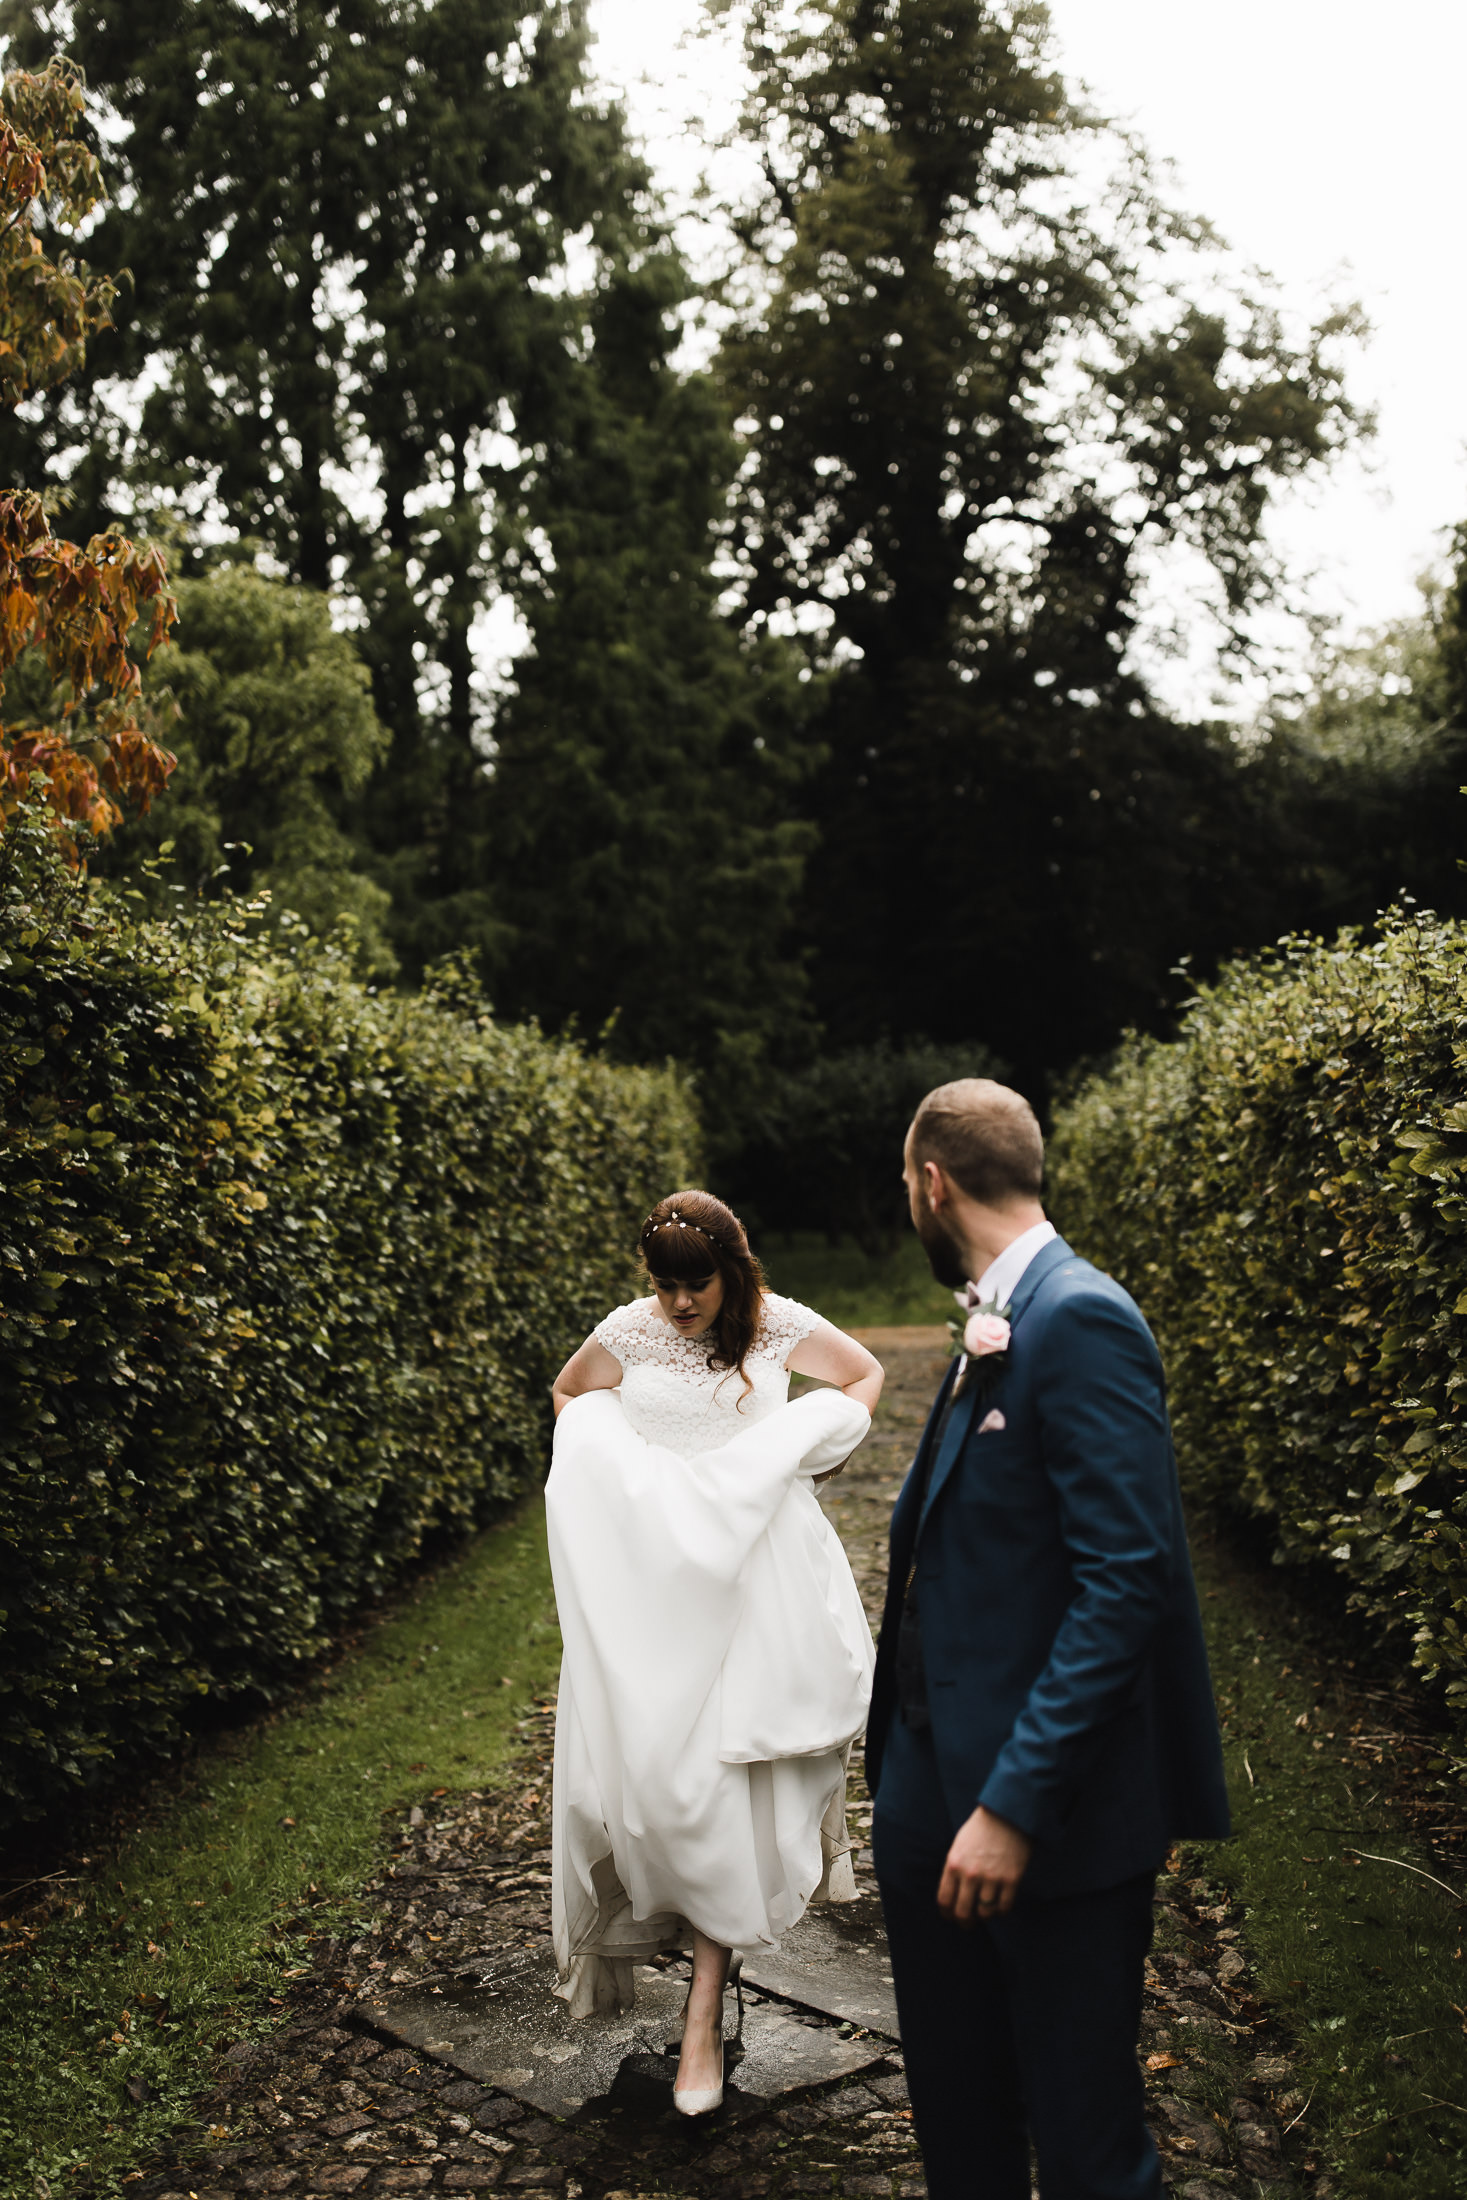 Nether_Wichendon_House_Wedding_056.jpg